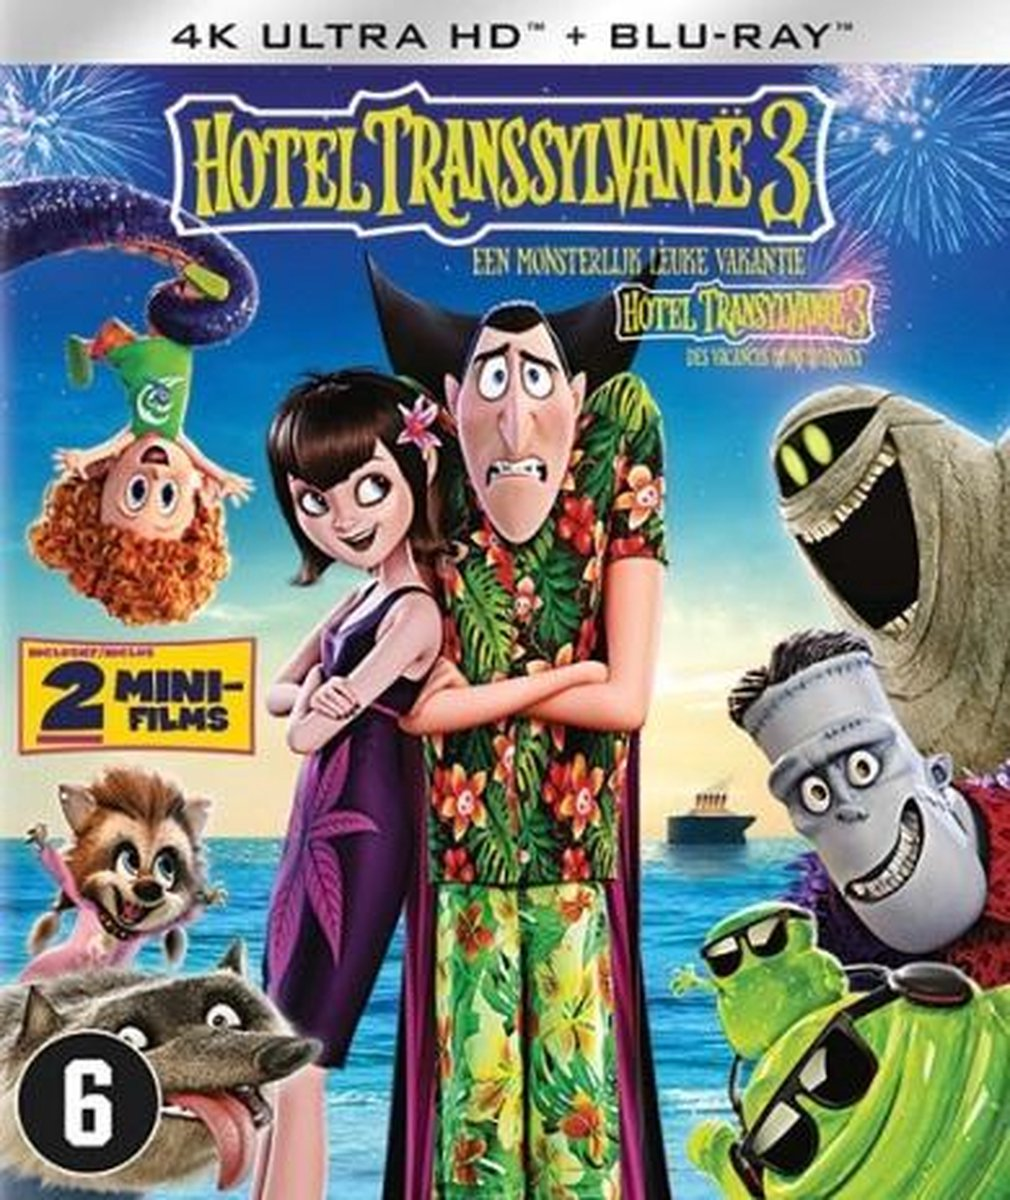 Hotel Transsylvanië 3 (4K Ultra HD Blu-ray)-